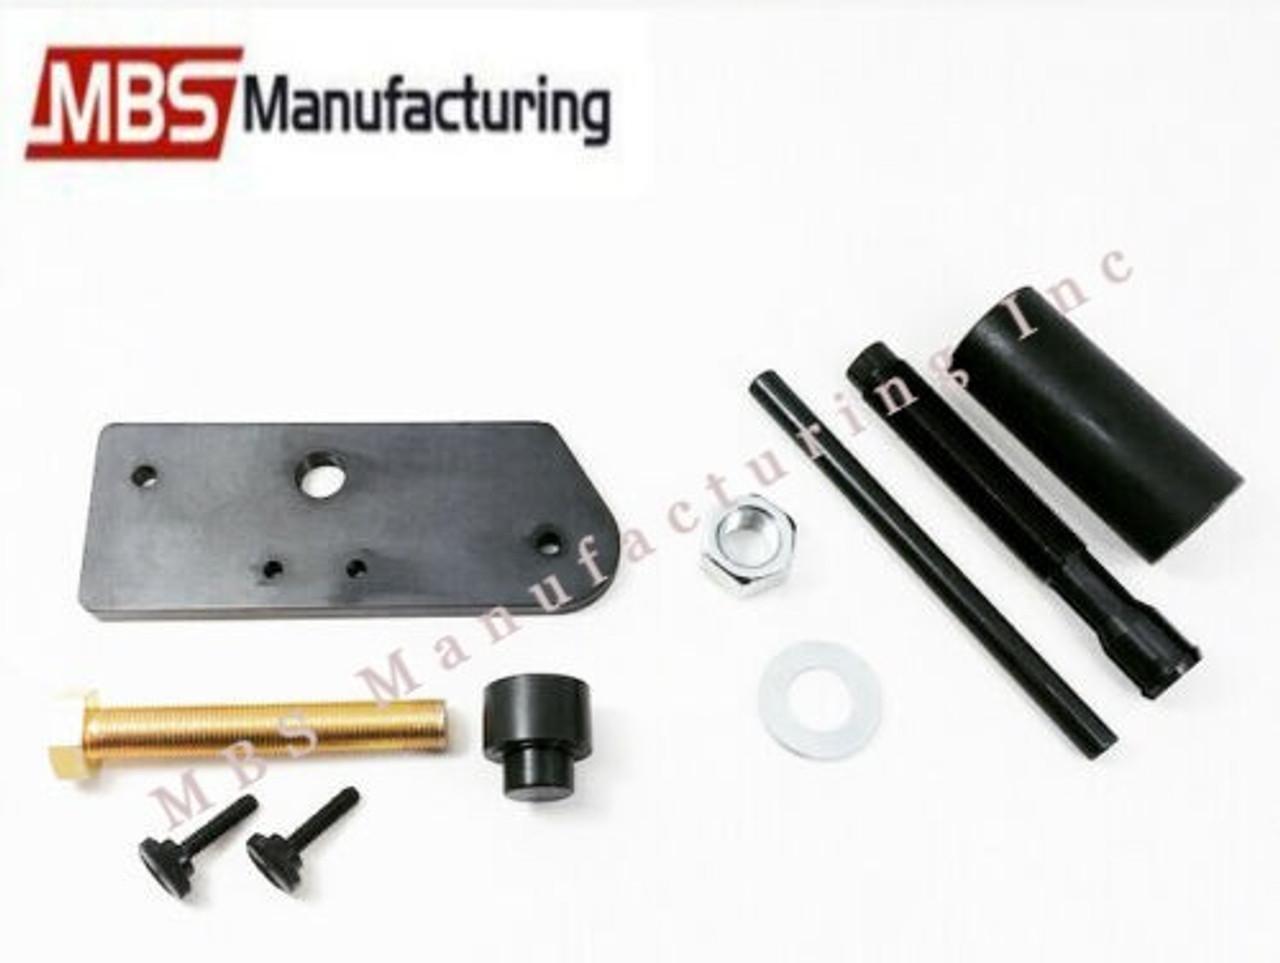 Inner Single Cam Bearing Puller and Installer Set Compatible for Harley Davidson EVO Evolution and (1) KOYO Bearing